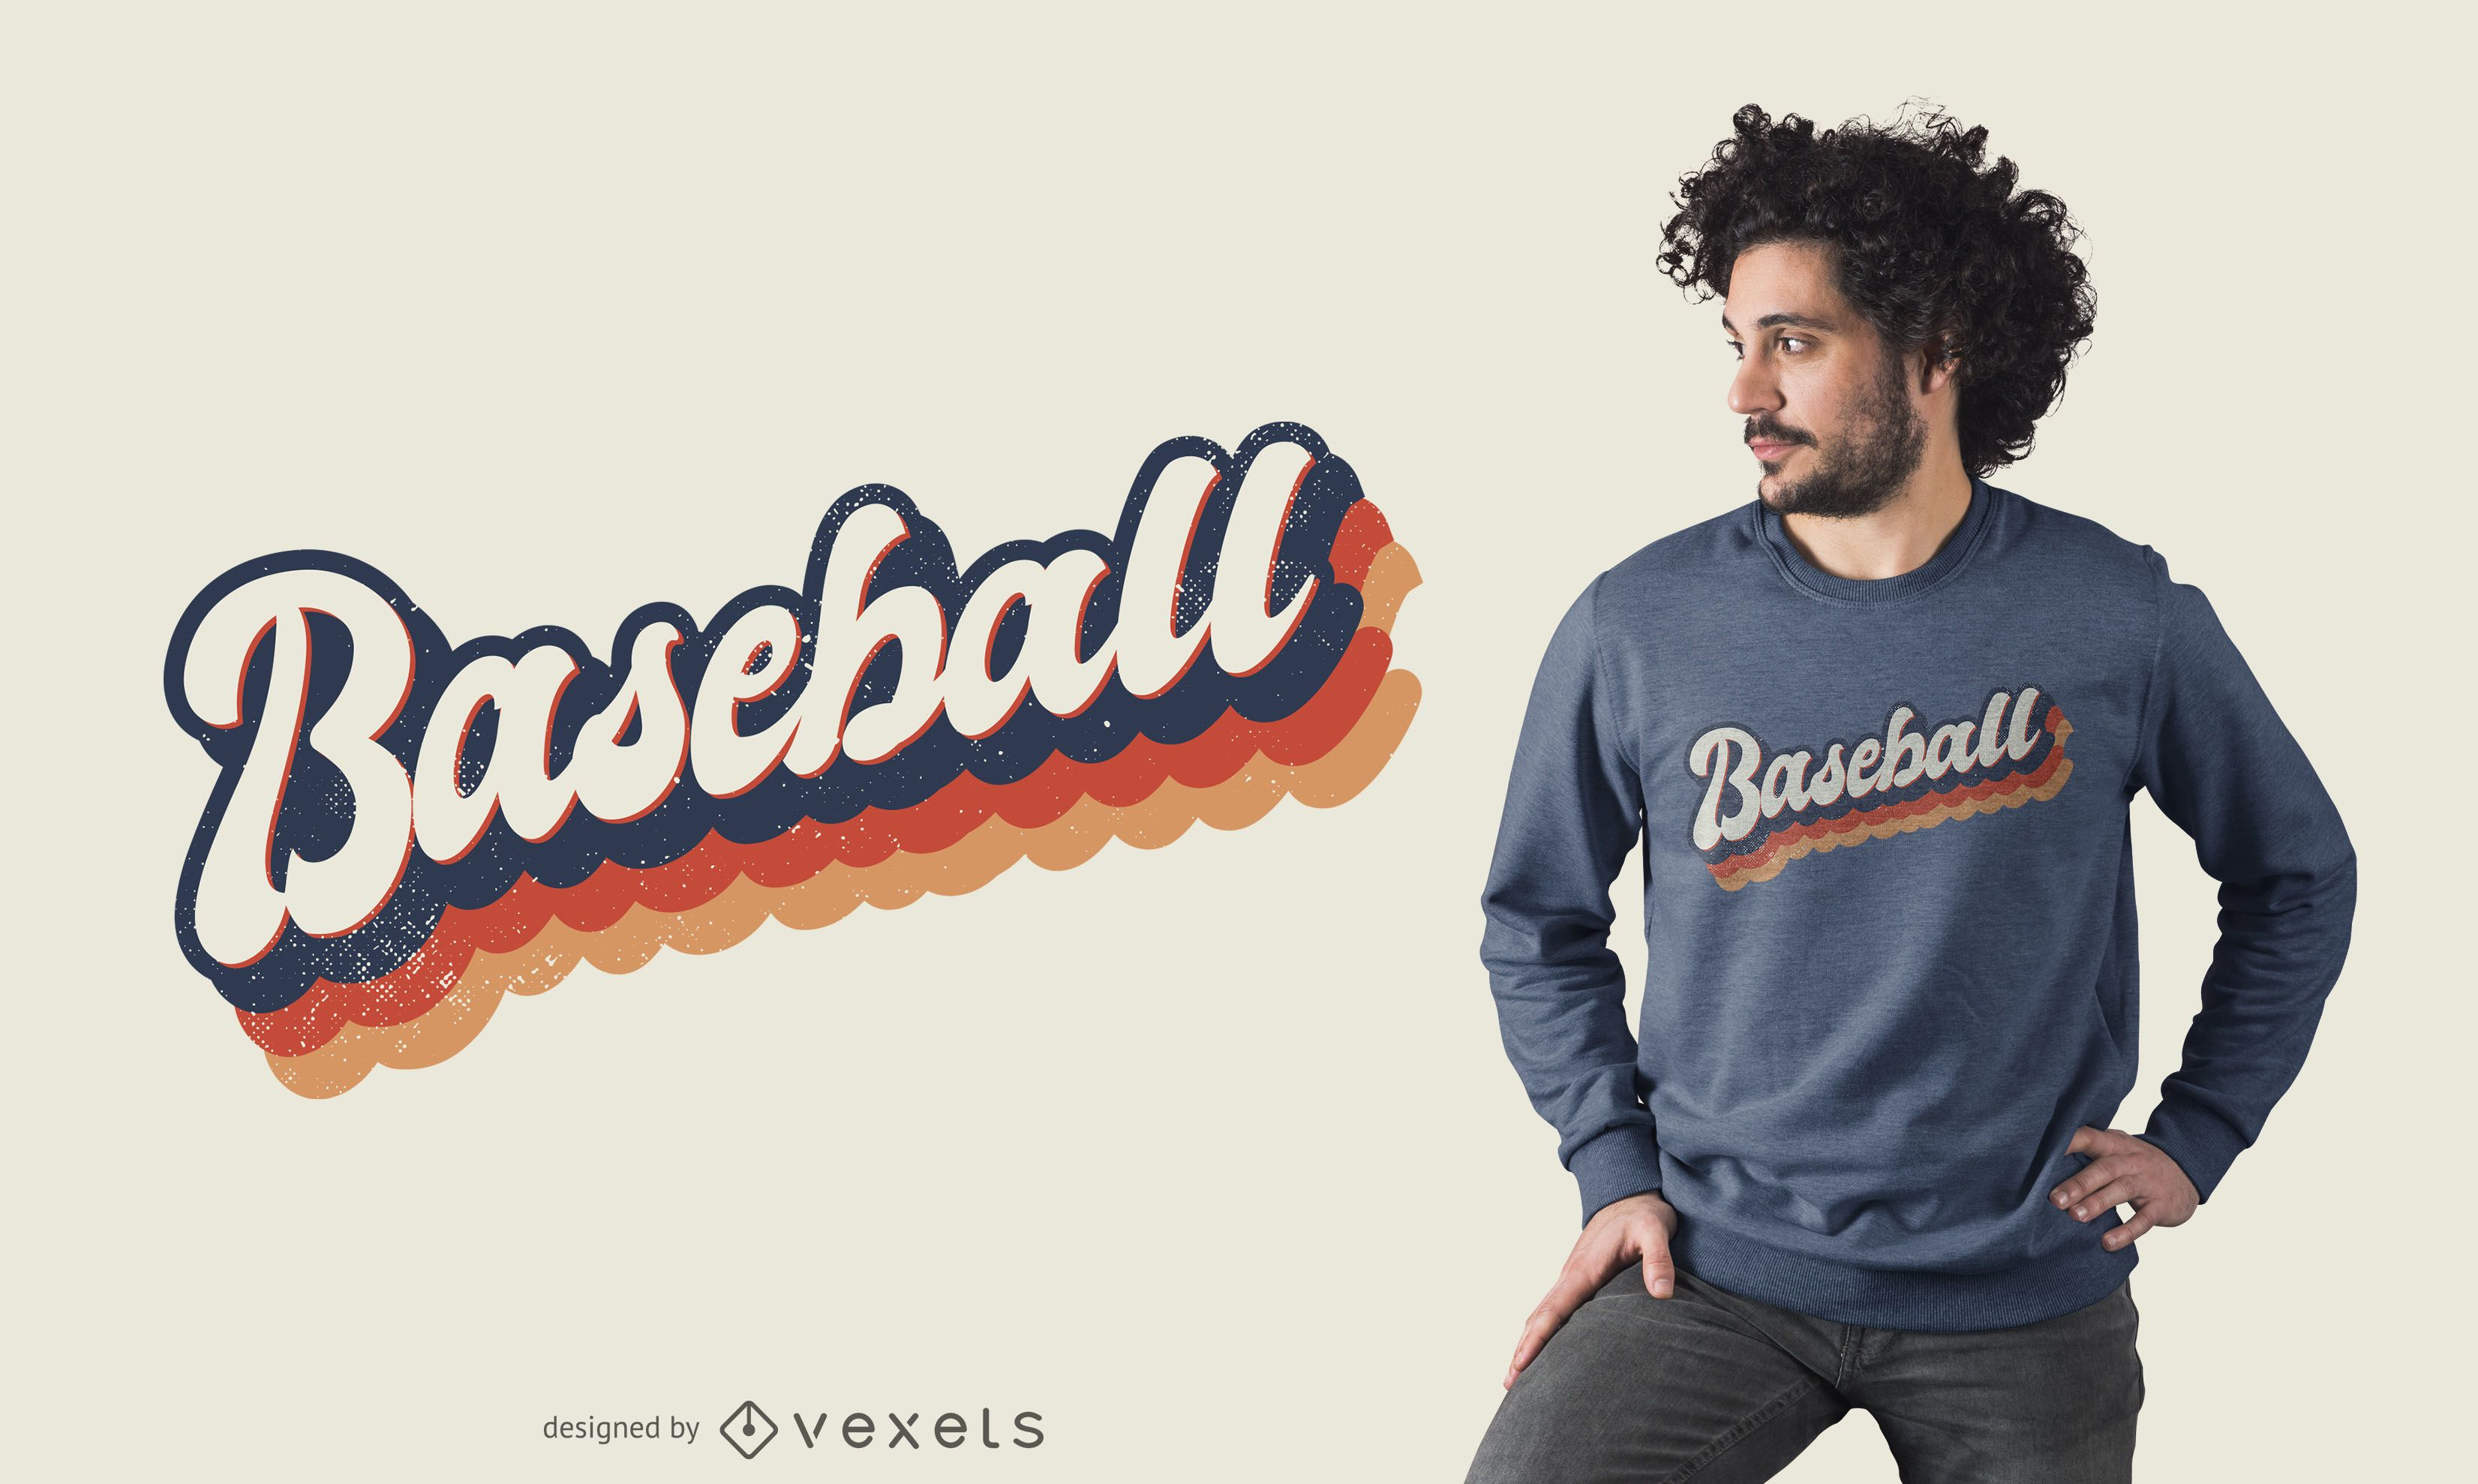 Diseño de camiseta colorida de béisbol